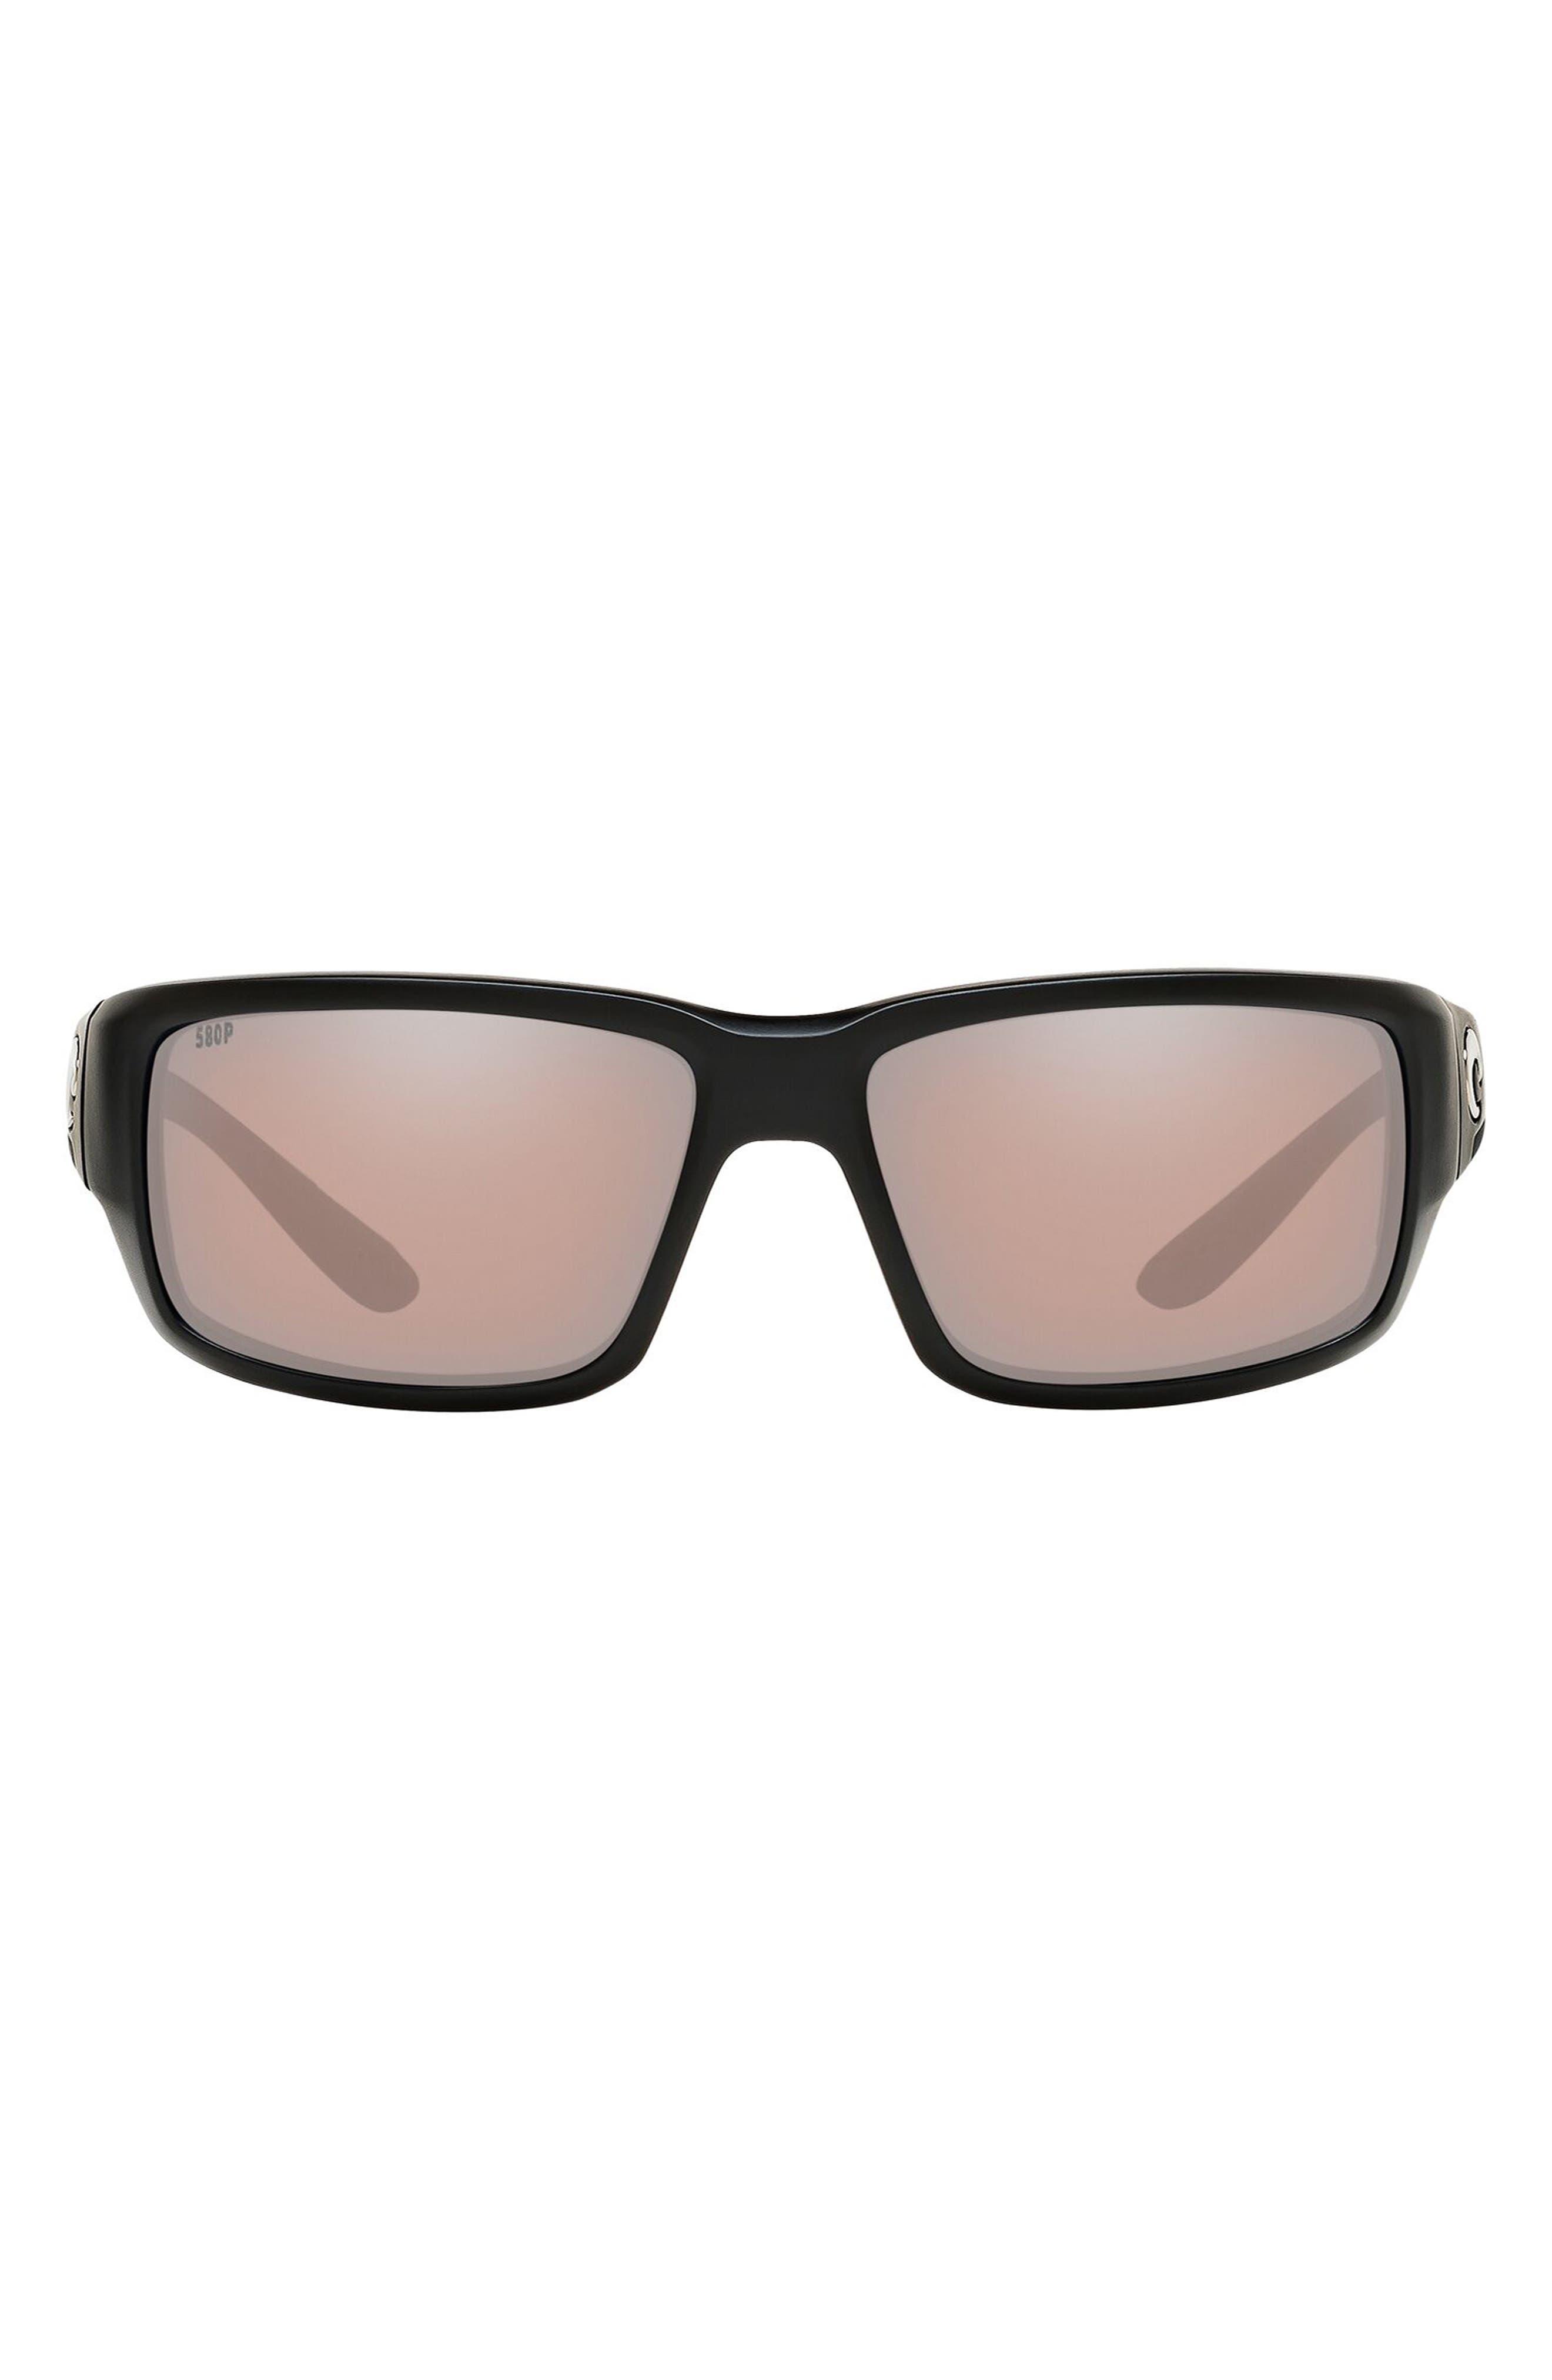 60mm Polarized Wraparound Sunglasses